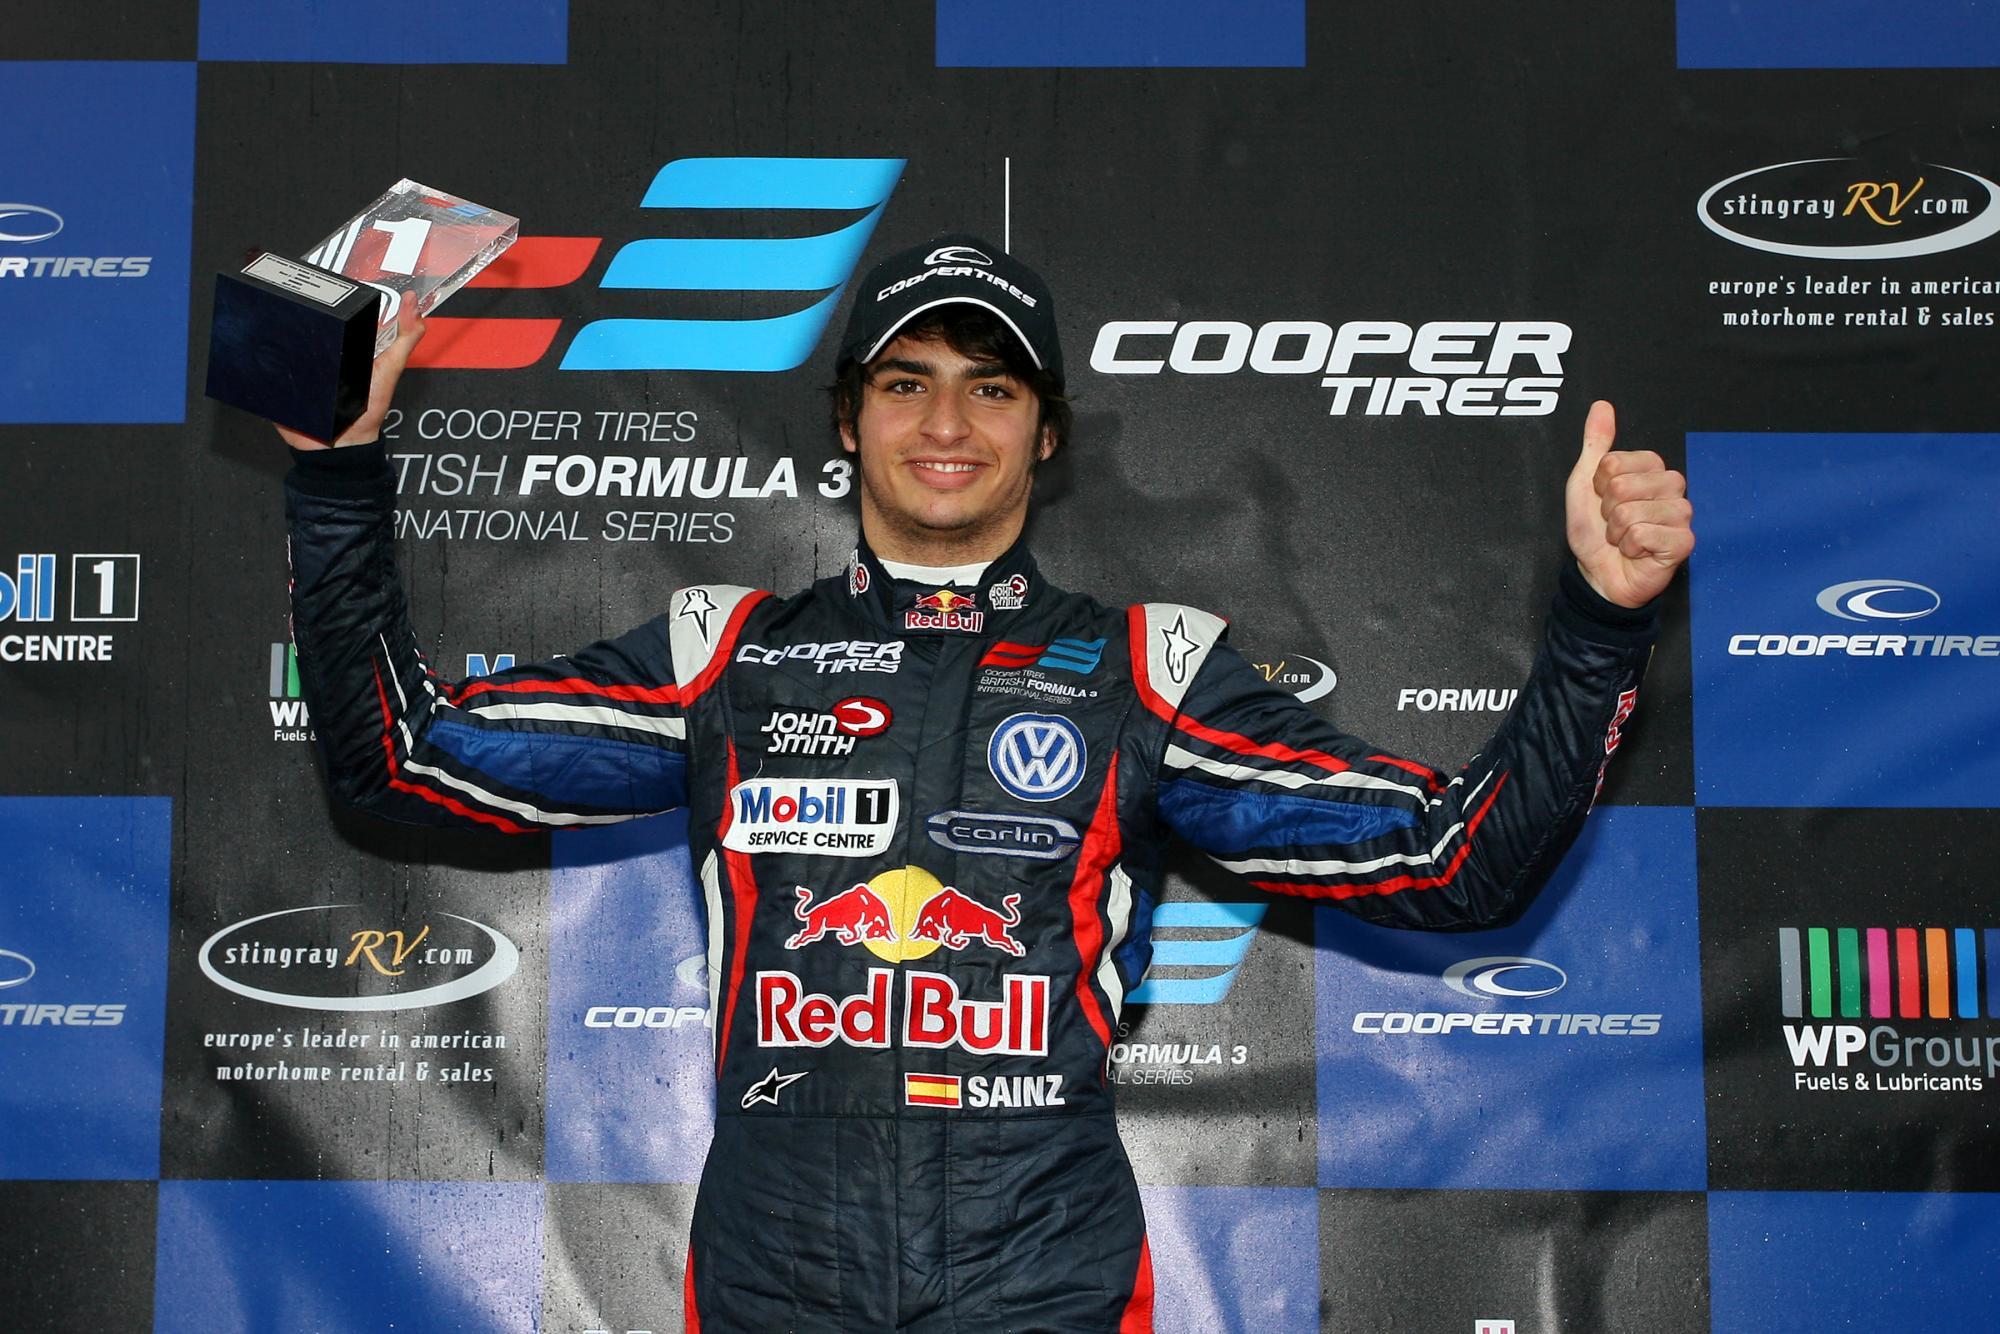 Carlos Sainz Jr: